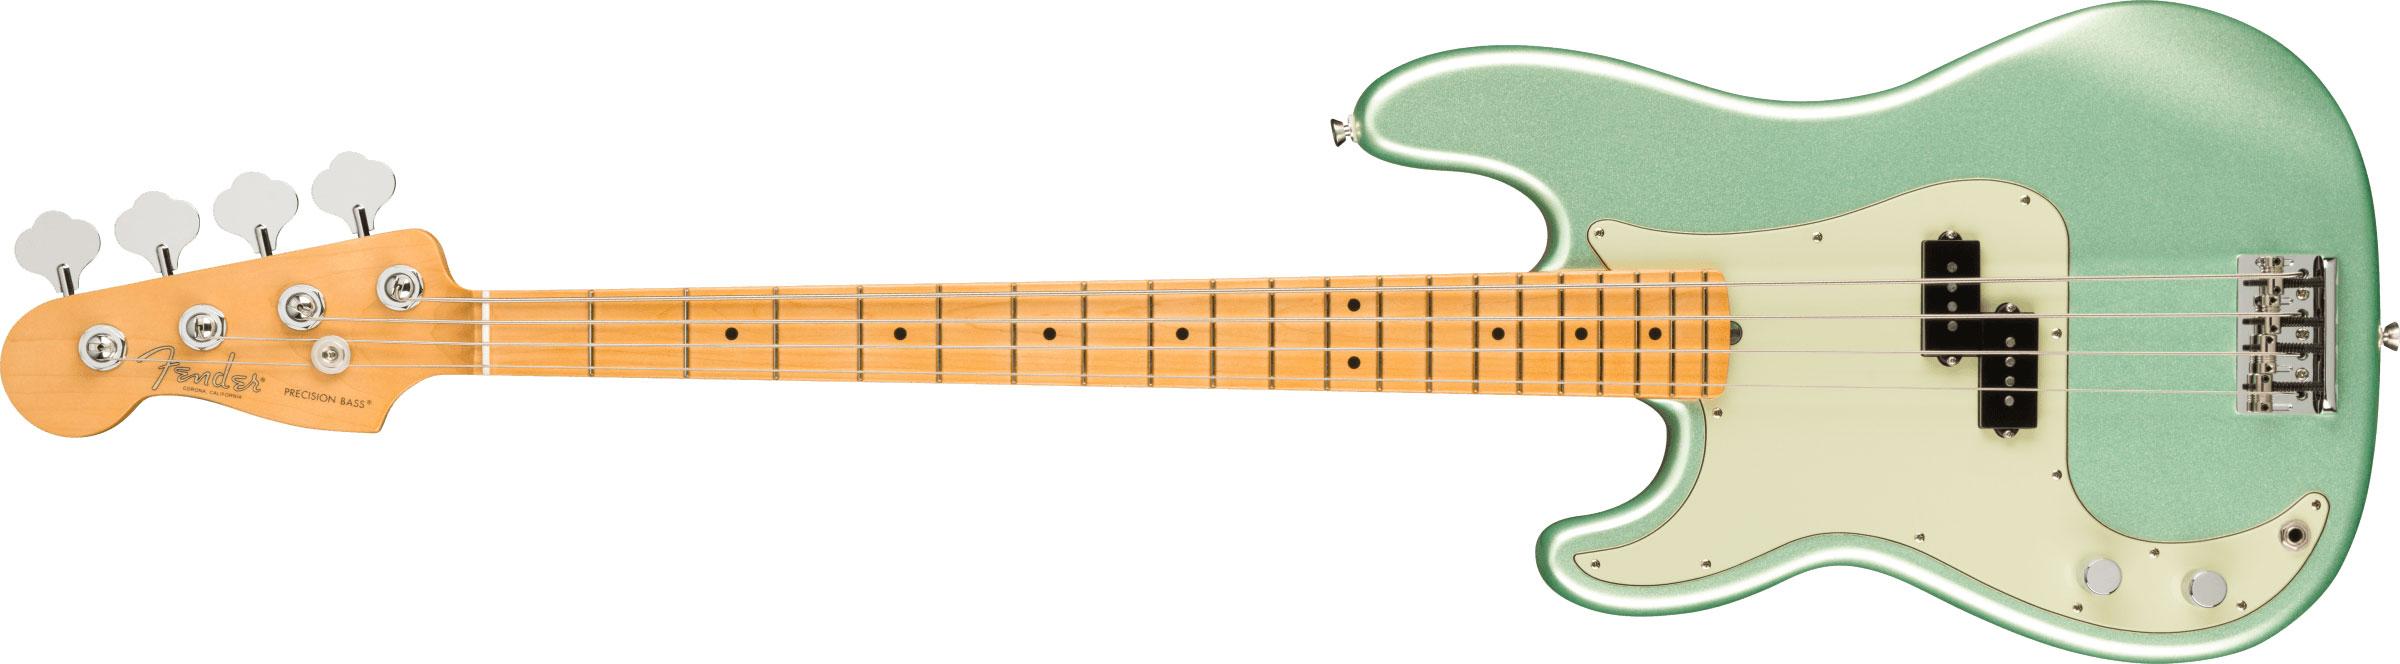 American Professional II Precision Bass Left-Handed (2020-) 画像1